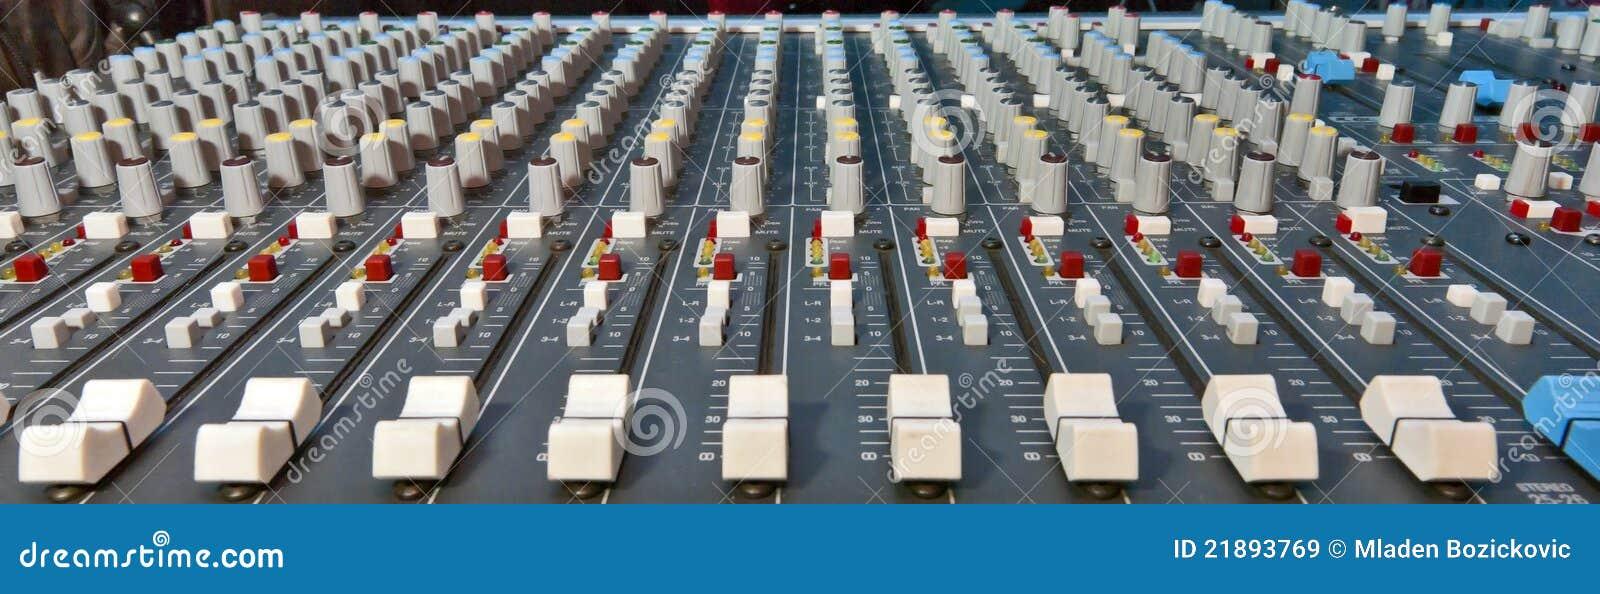 Music mixer stock image  Image of bass, disco, editing - 21893769